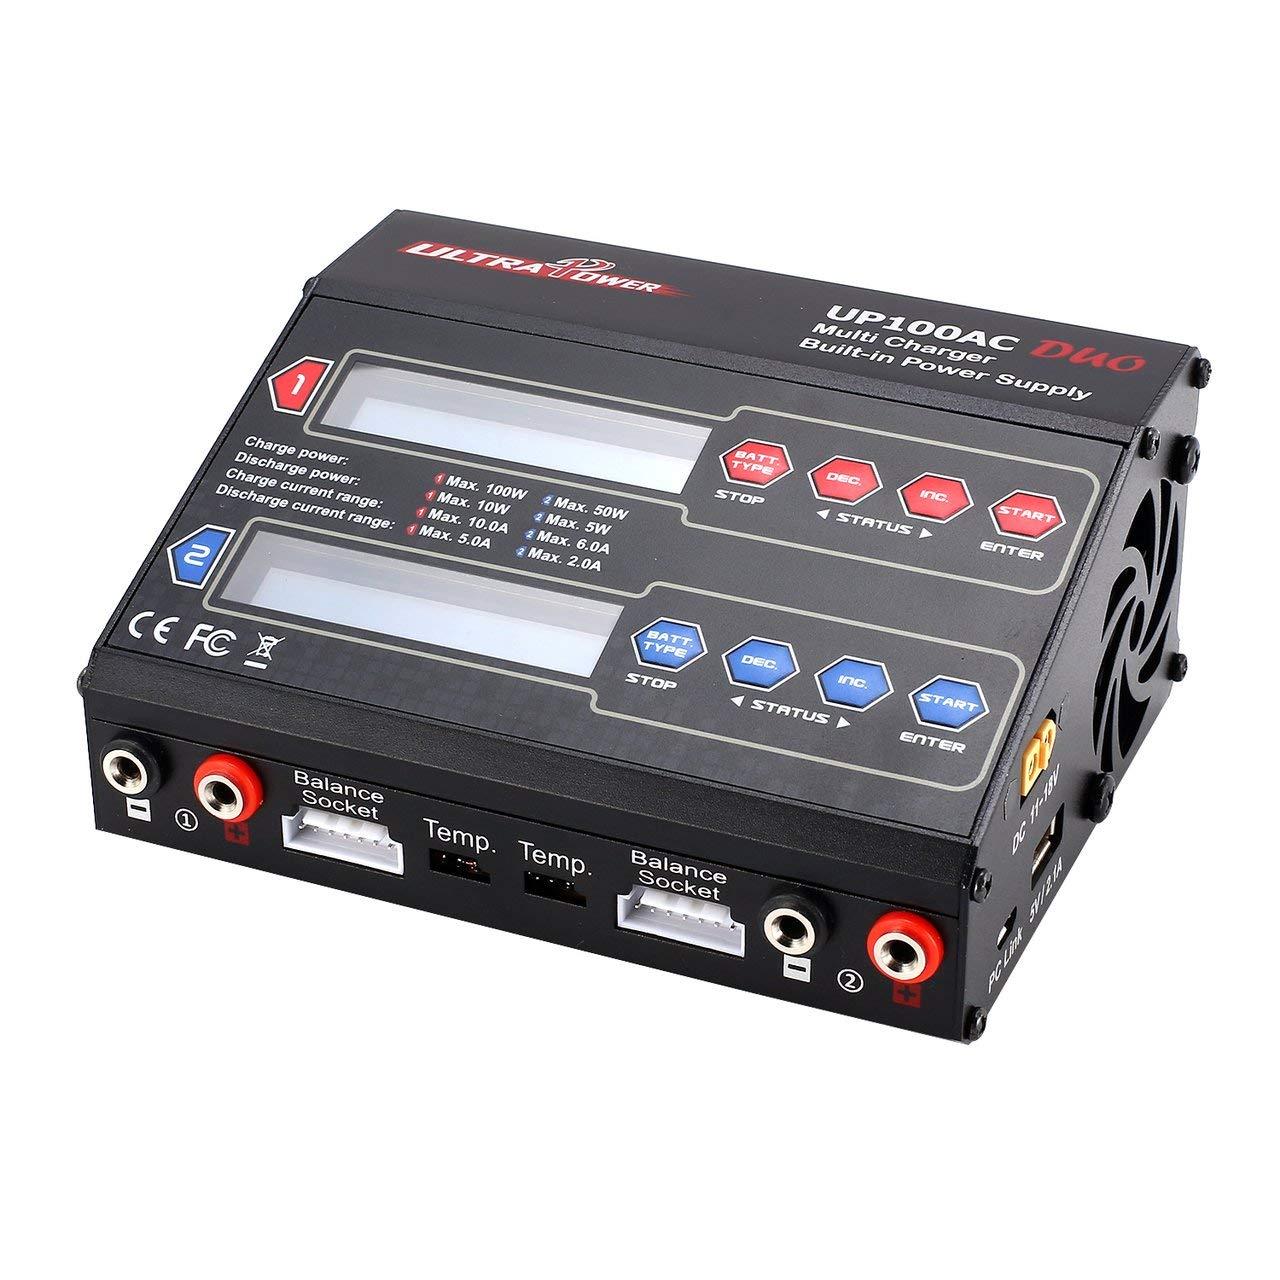 Jasnyfall Ultra Power UP240AC UP240AC UP240AC Plus 240W 4 Türen Batterie Multi Balance Ladegerät für RC - Schwarz 34a342